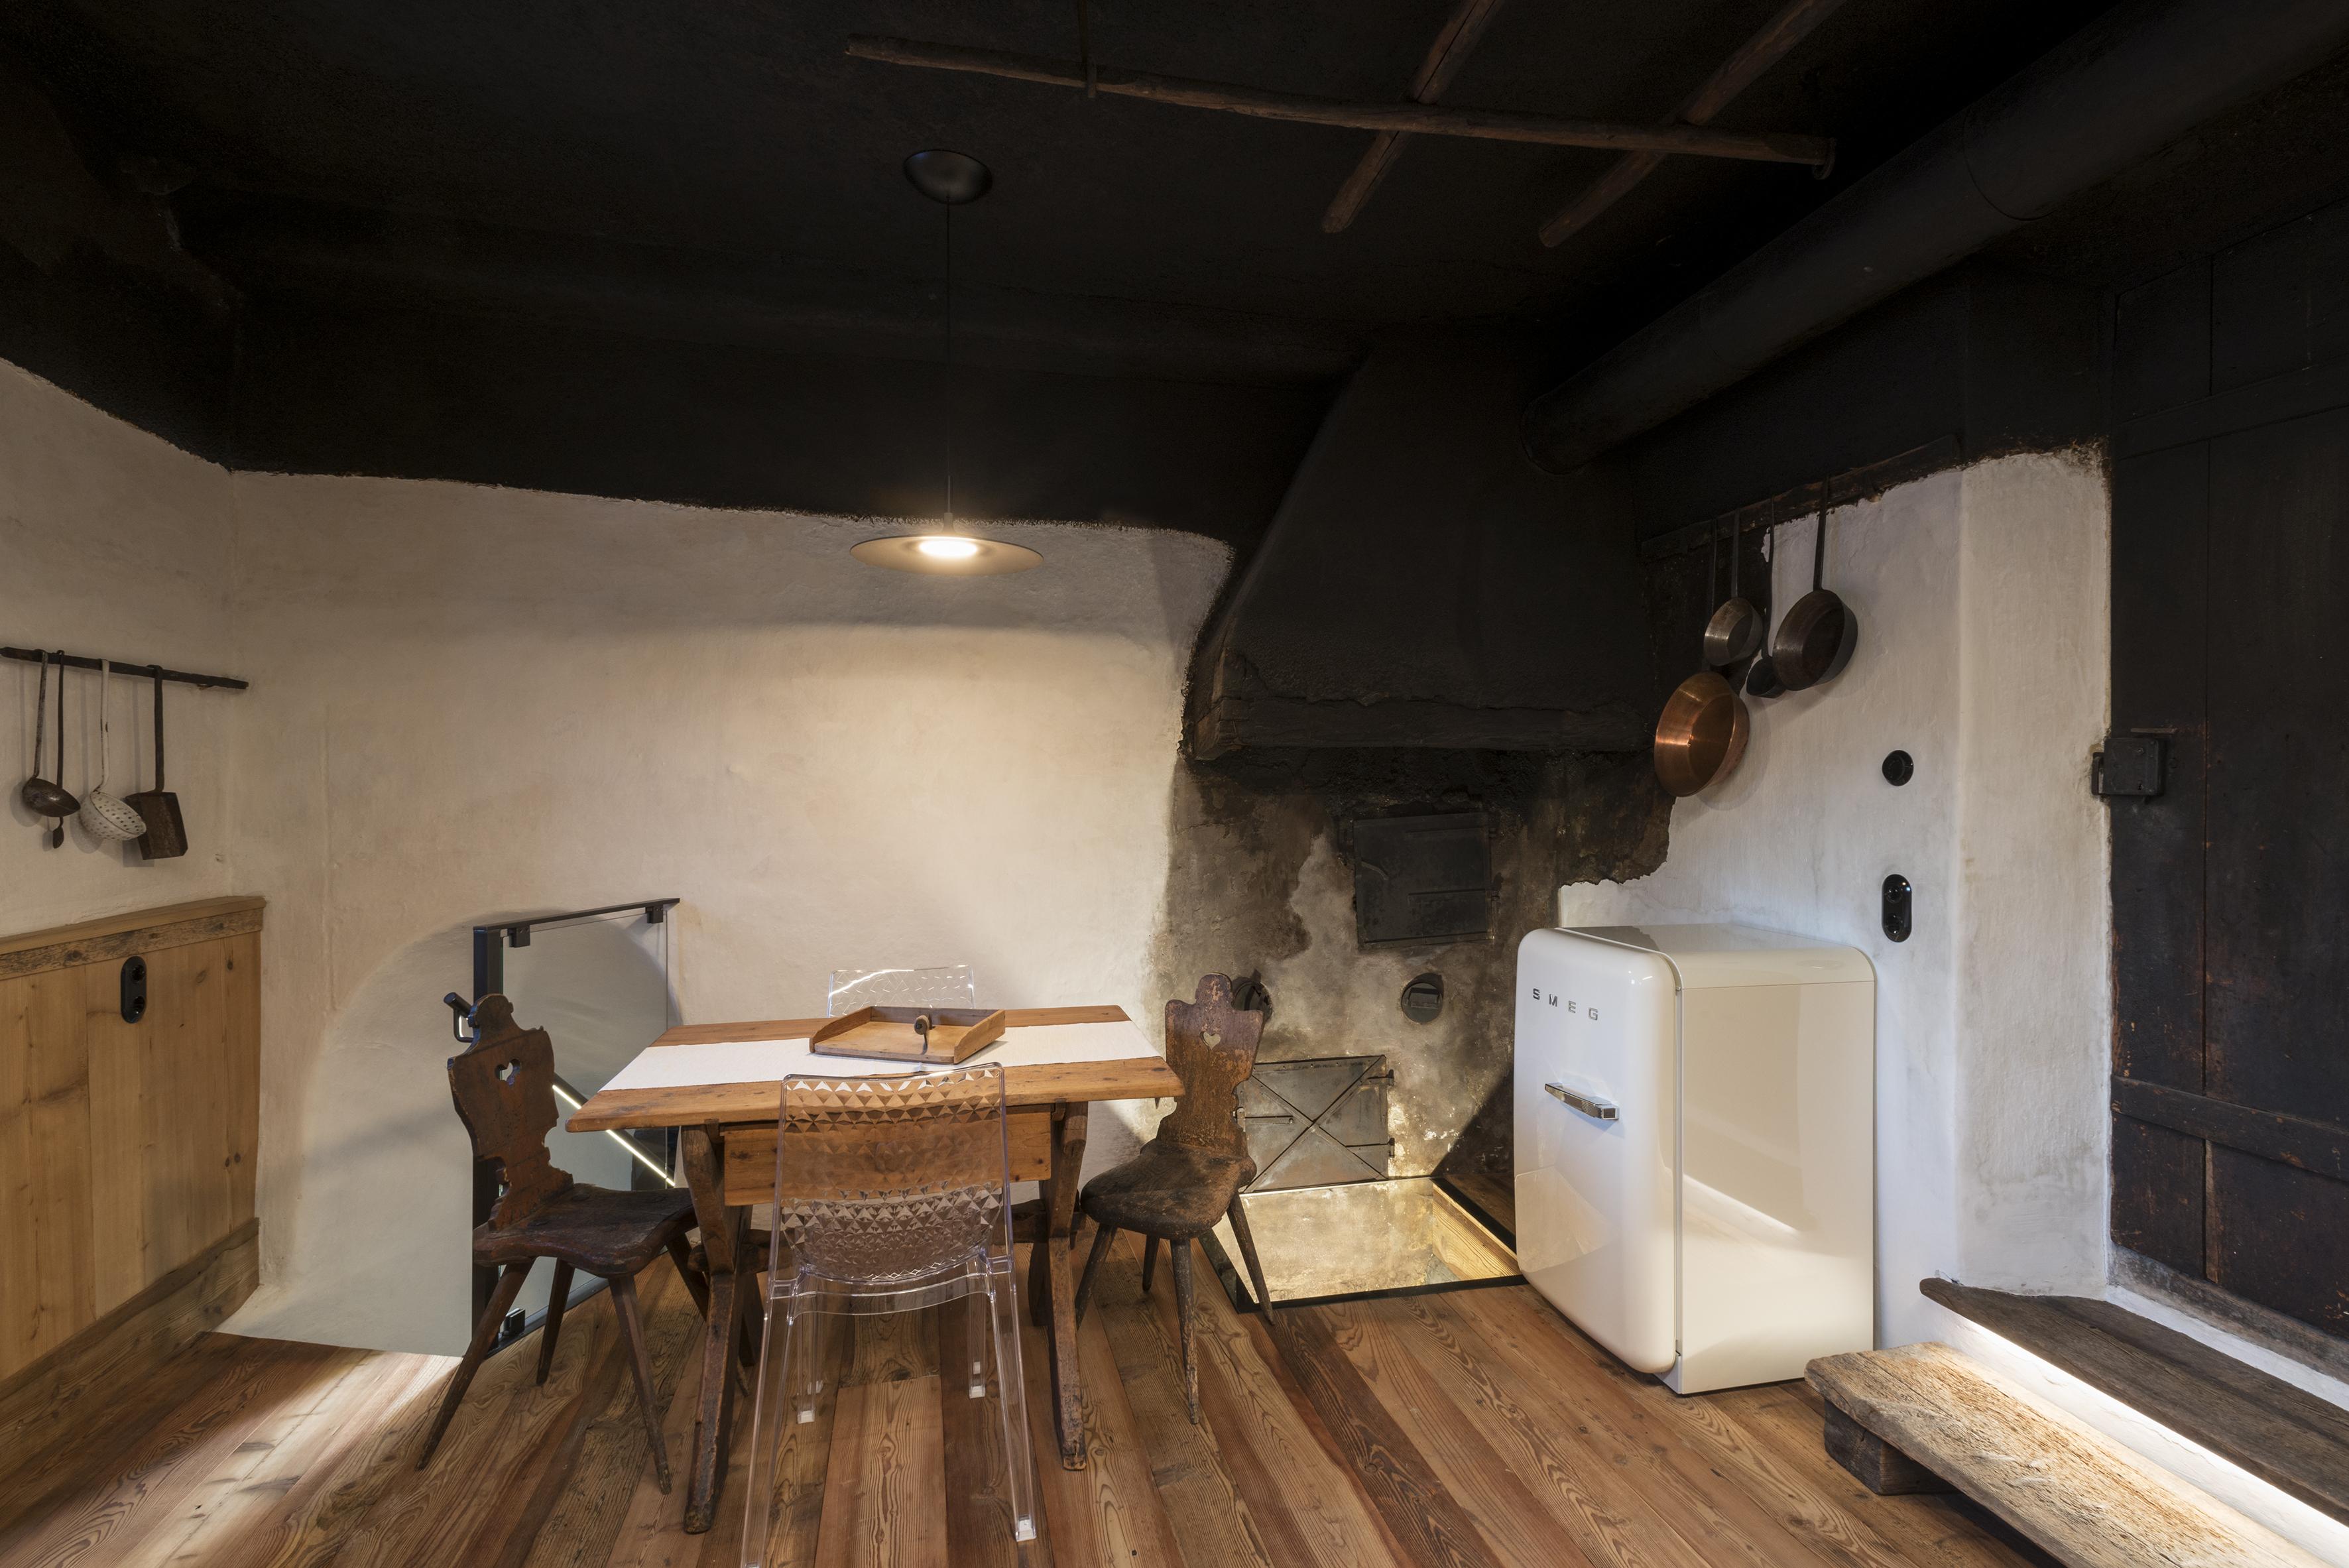 Kitchen 'Rachkuchl'